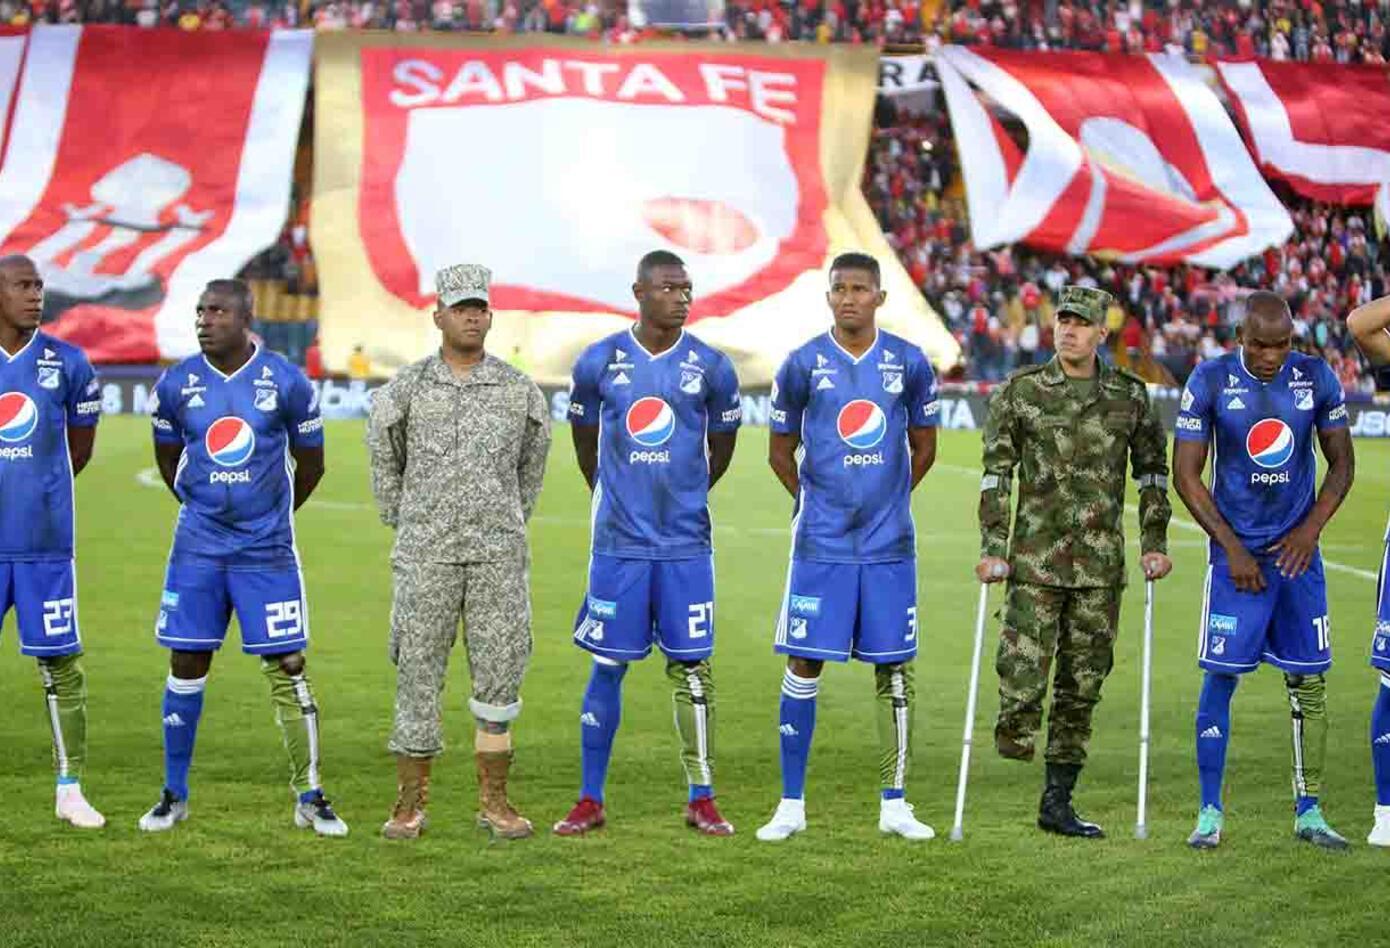 Santa Fe - Millonarios 2019 I